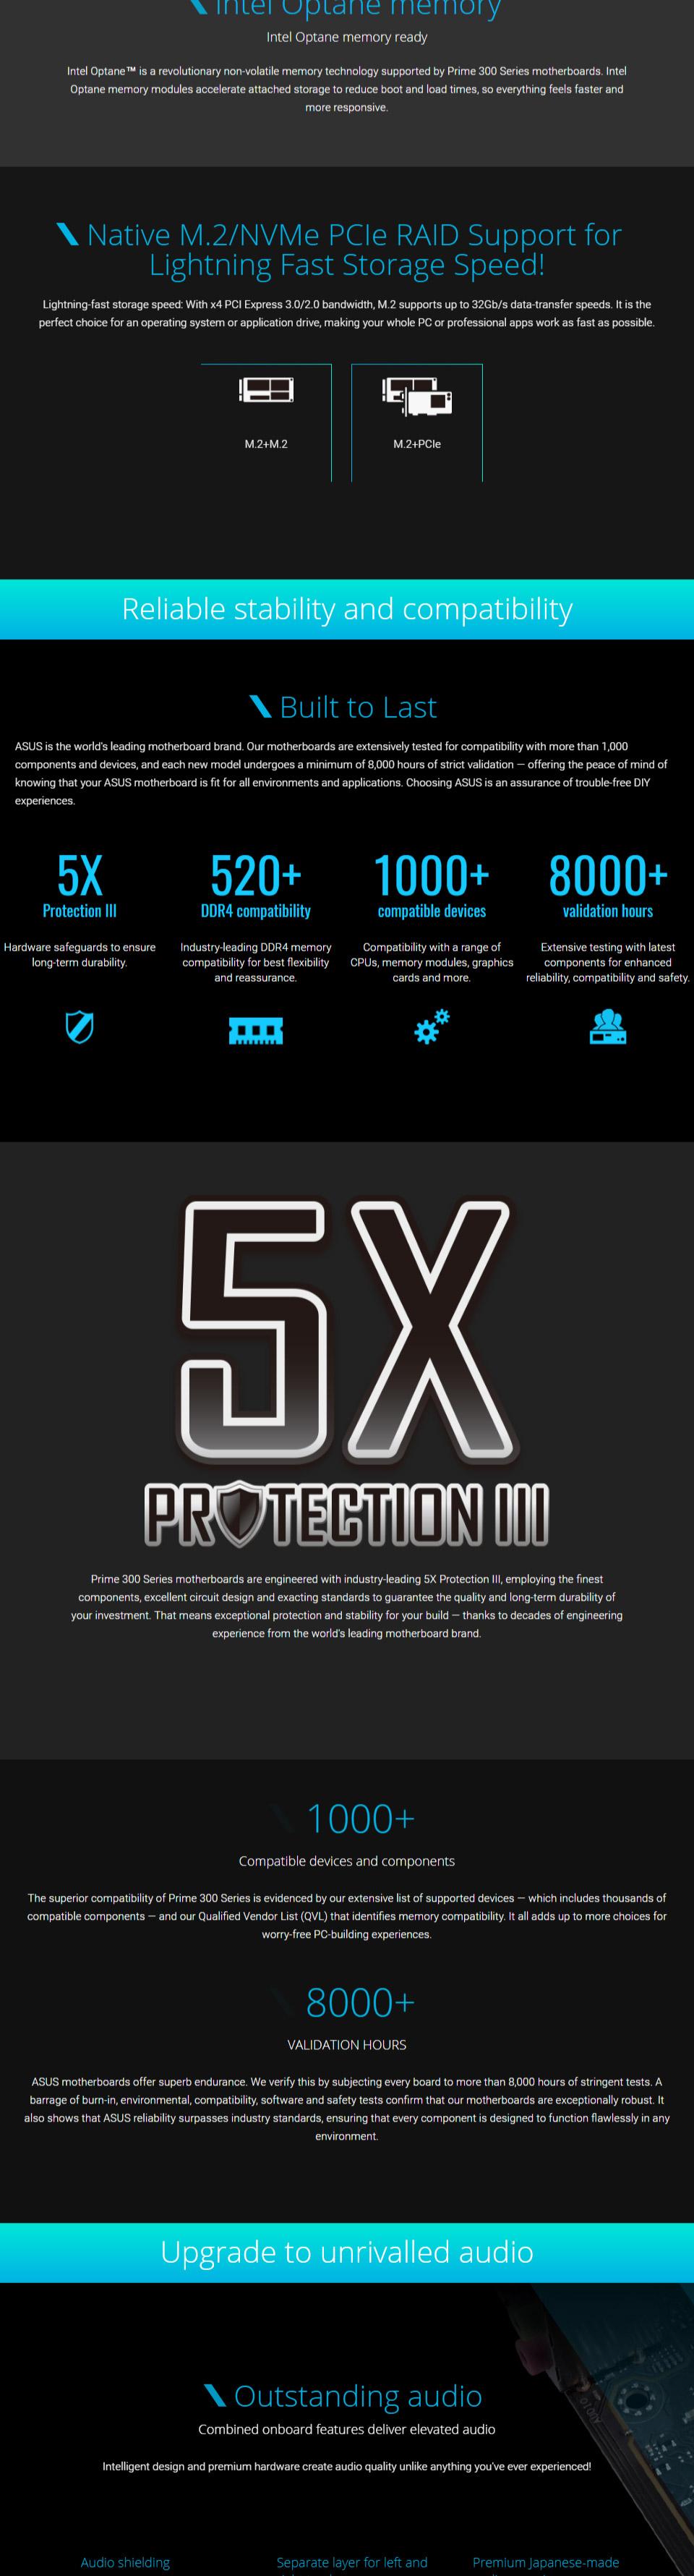 ASUS Prime B360M-A CSM Motherboard [PRIME B360M-A/CSM] : PC Case Gear